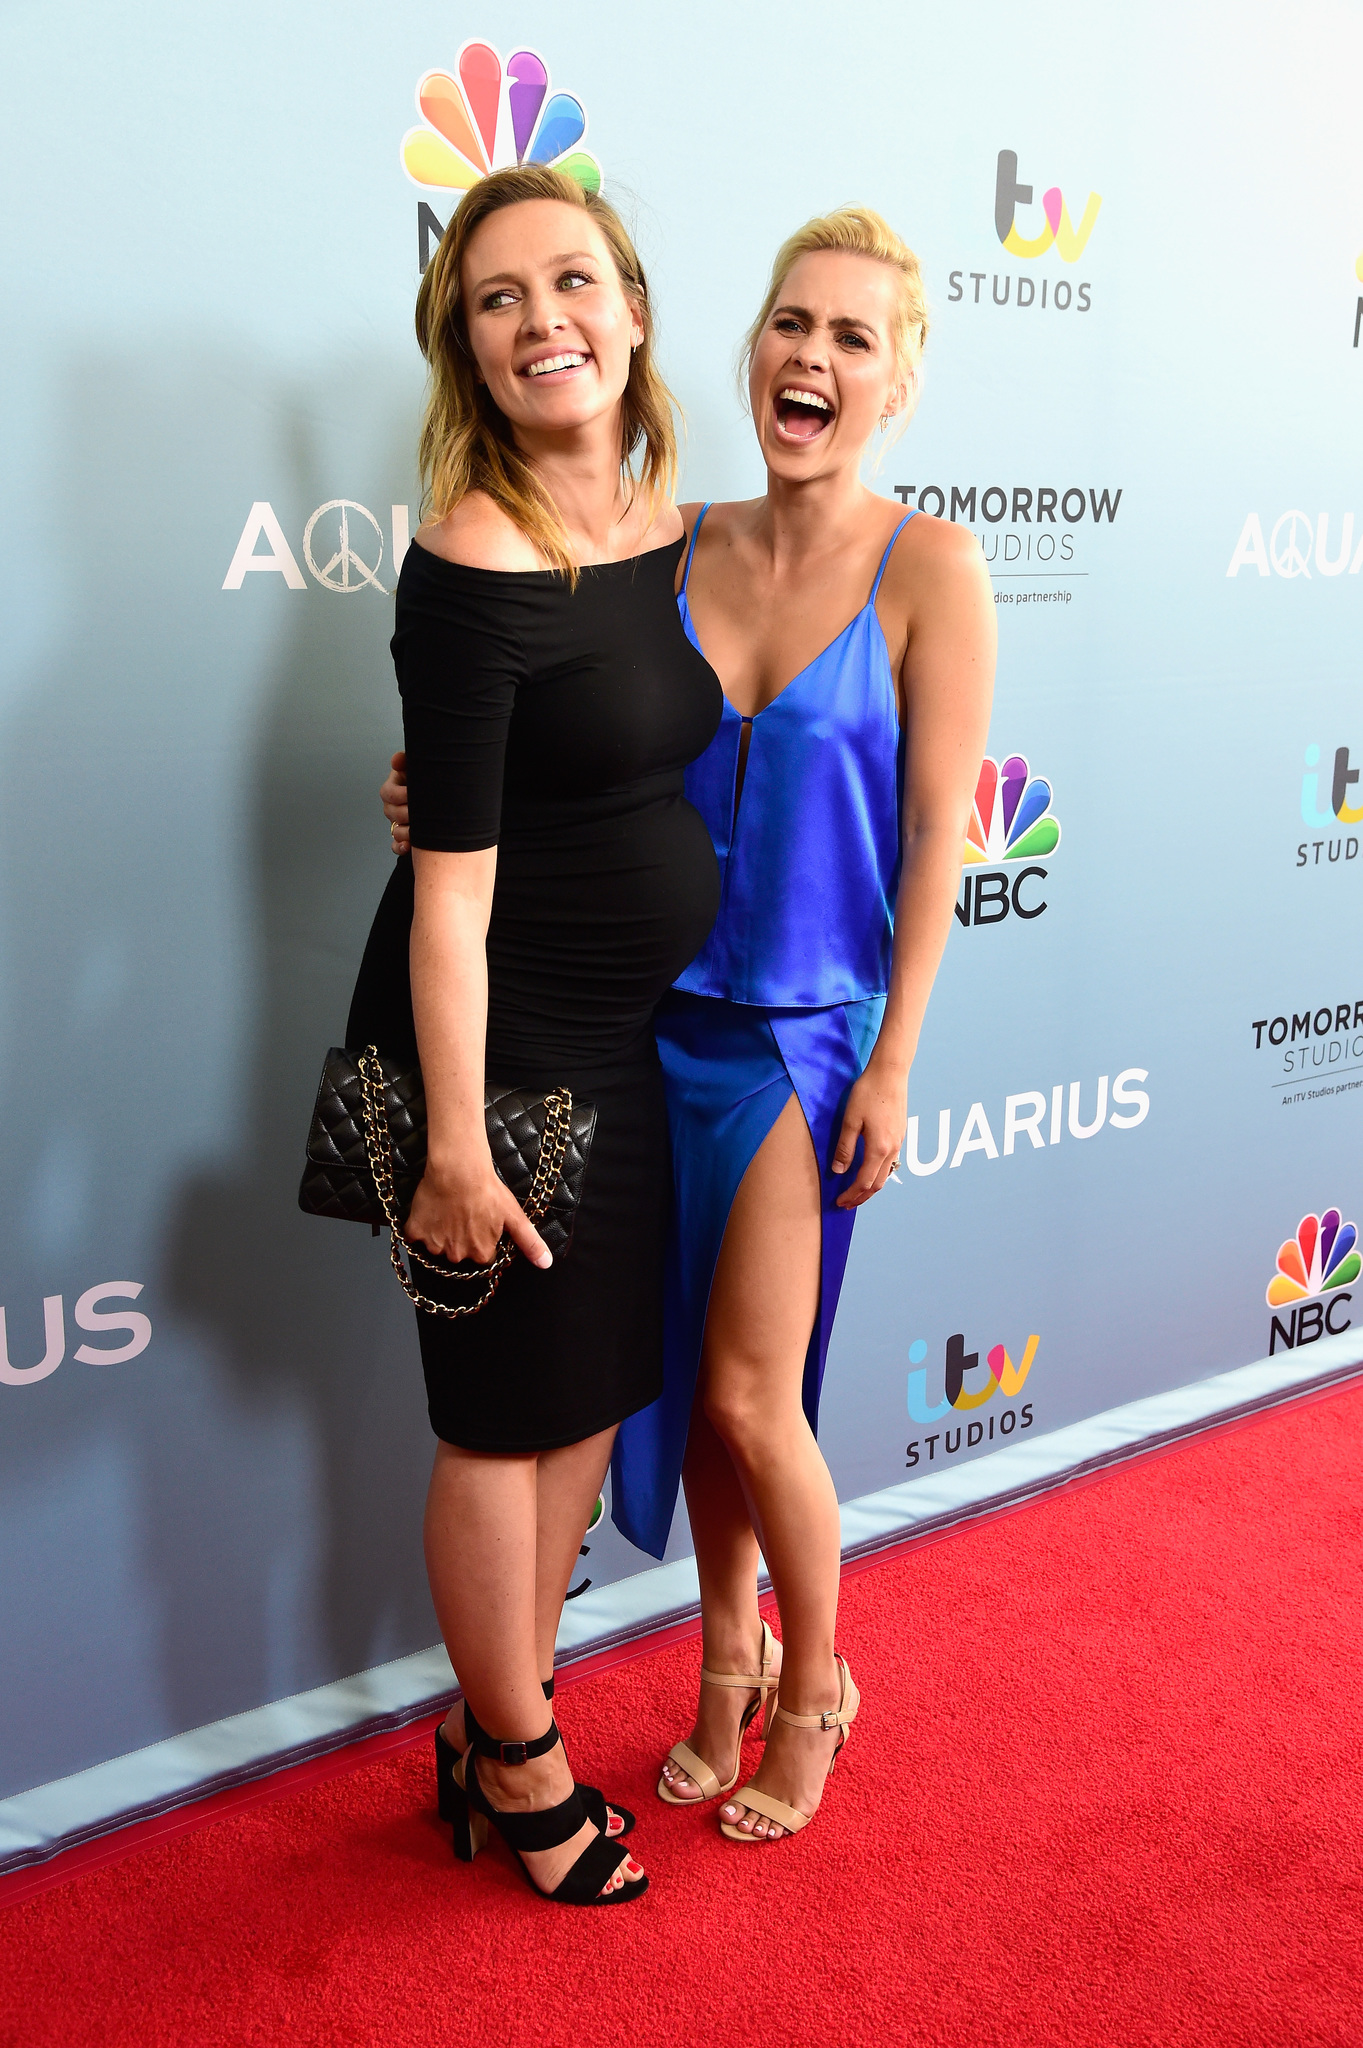 Michaela McManus and Claire Holt at an event for Aquarius (2015)